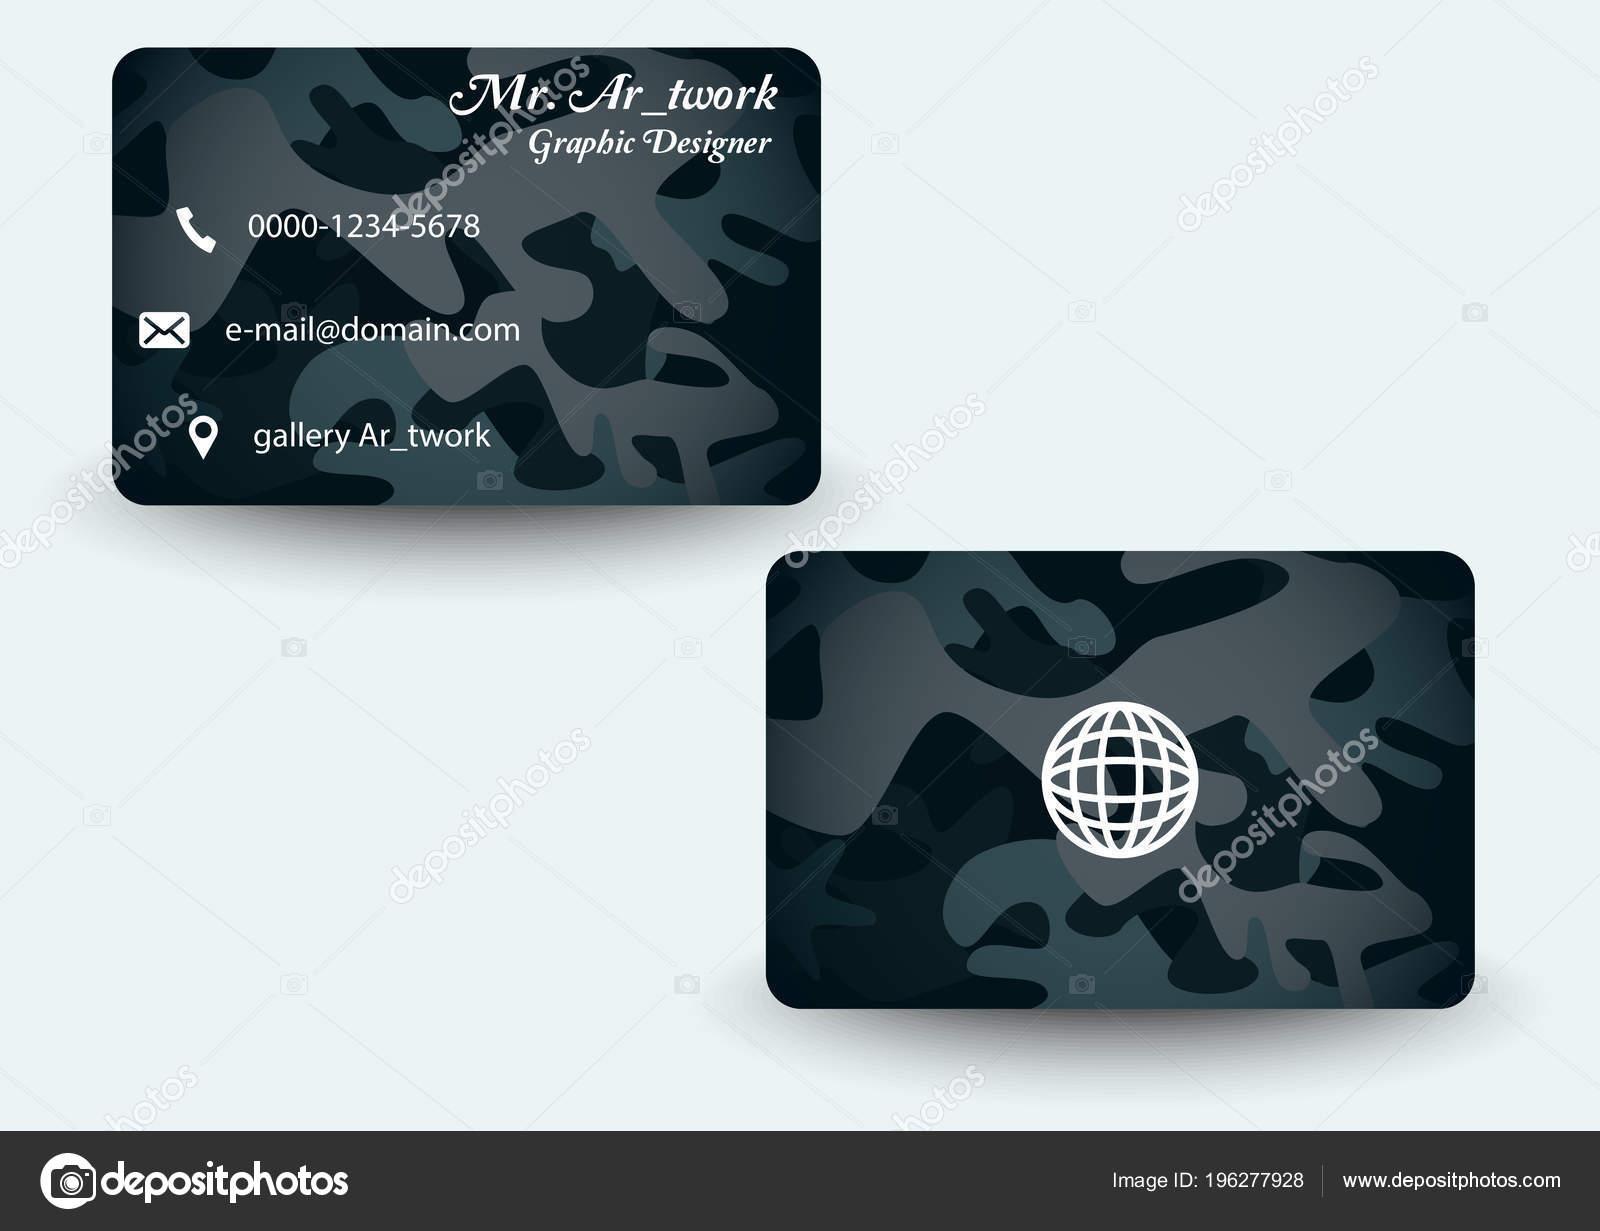 Armee Muster Visitenkarte — Stockvektor © AR_twork #196277928